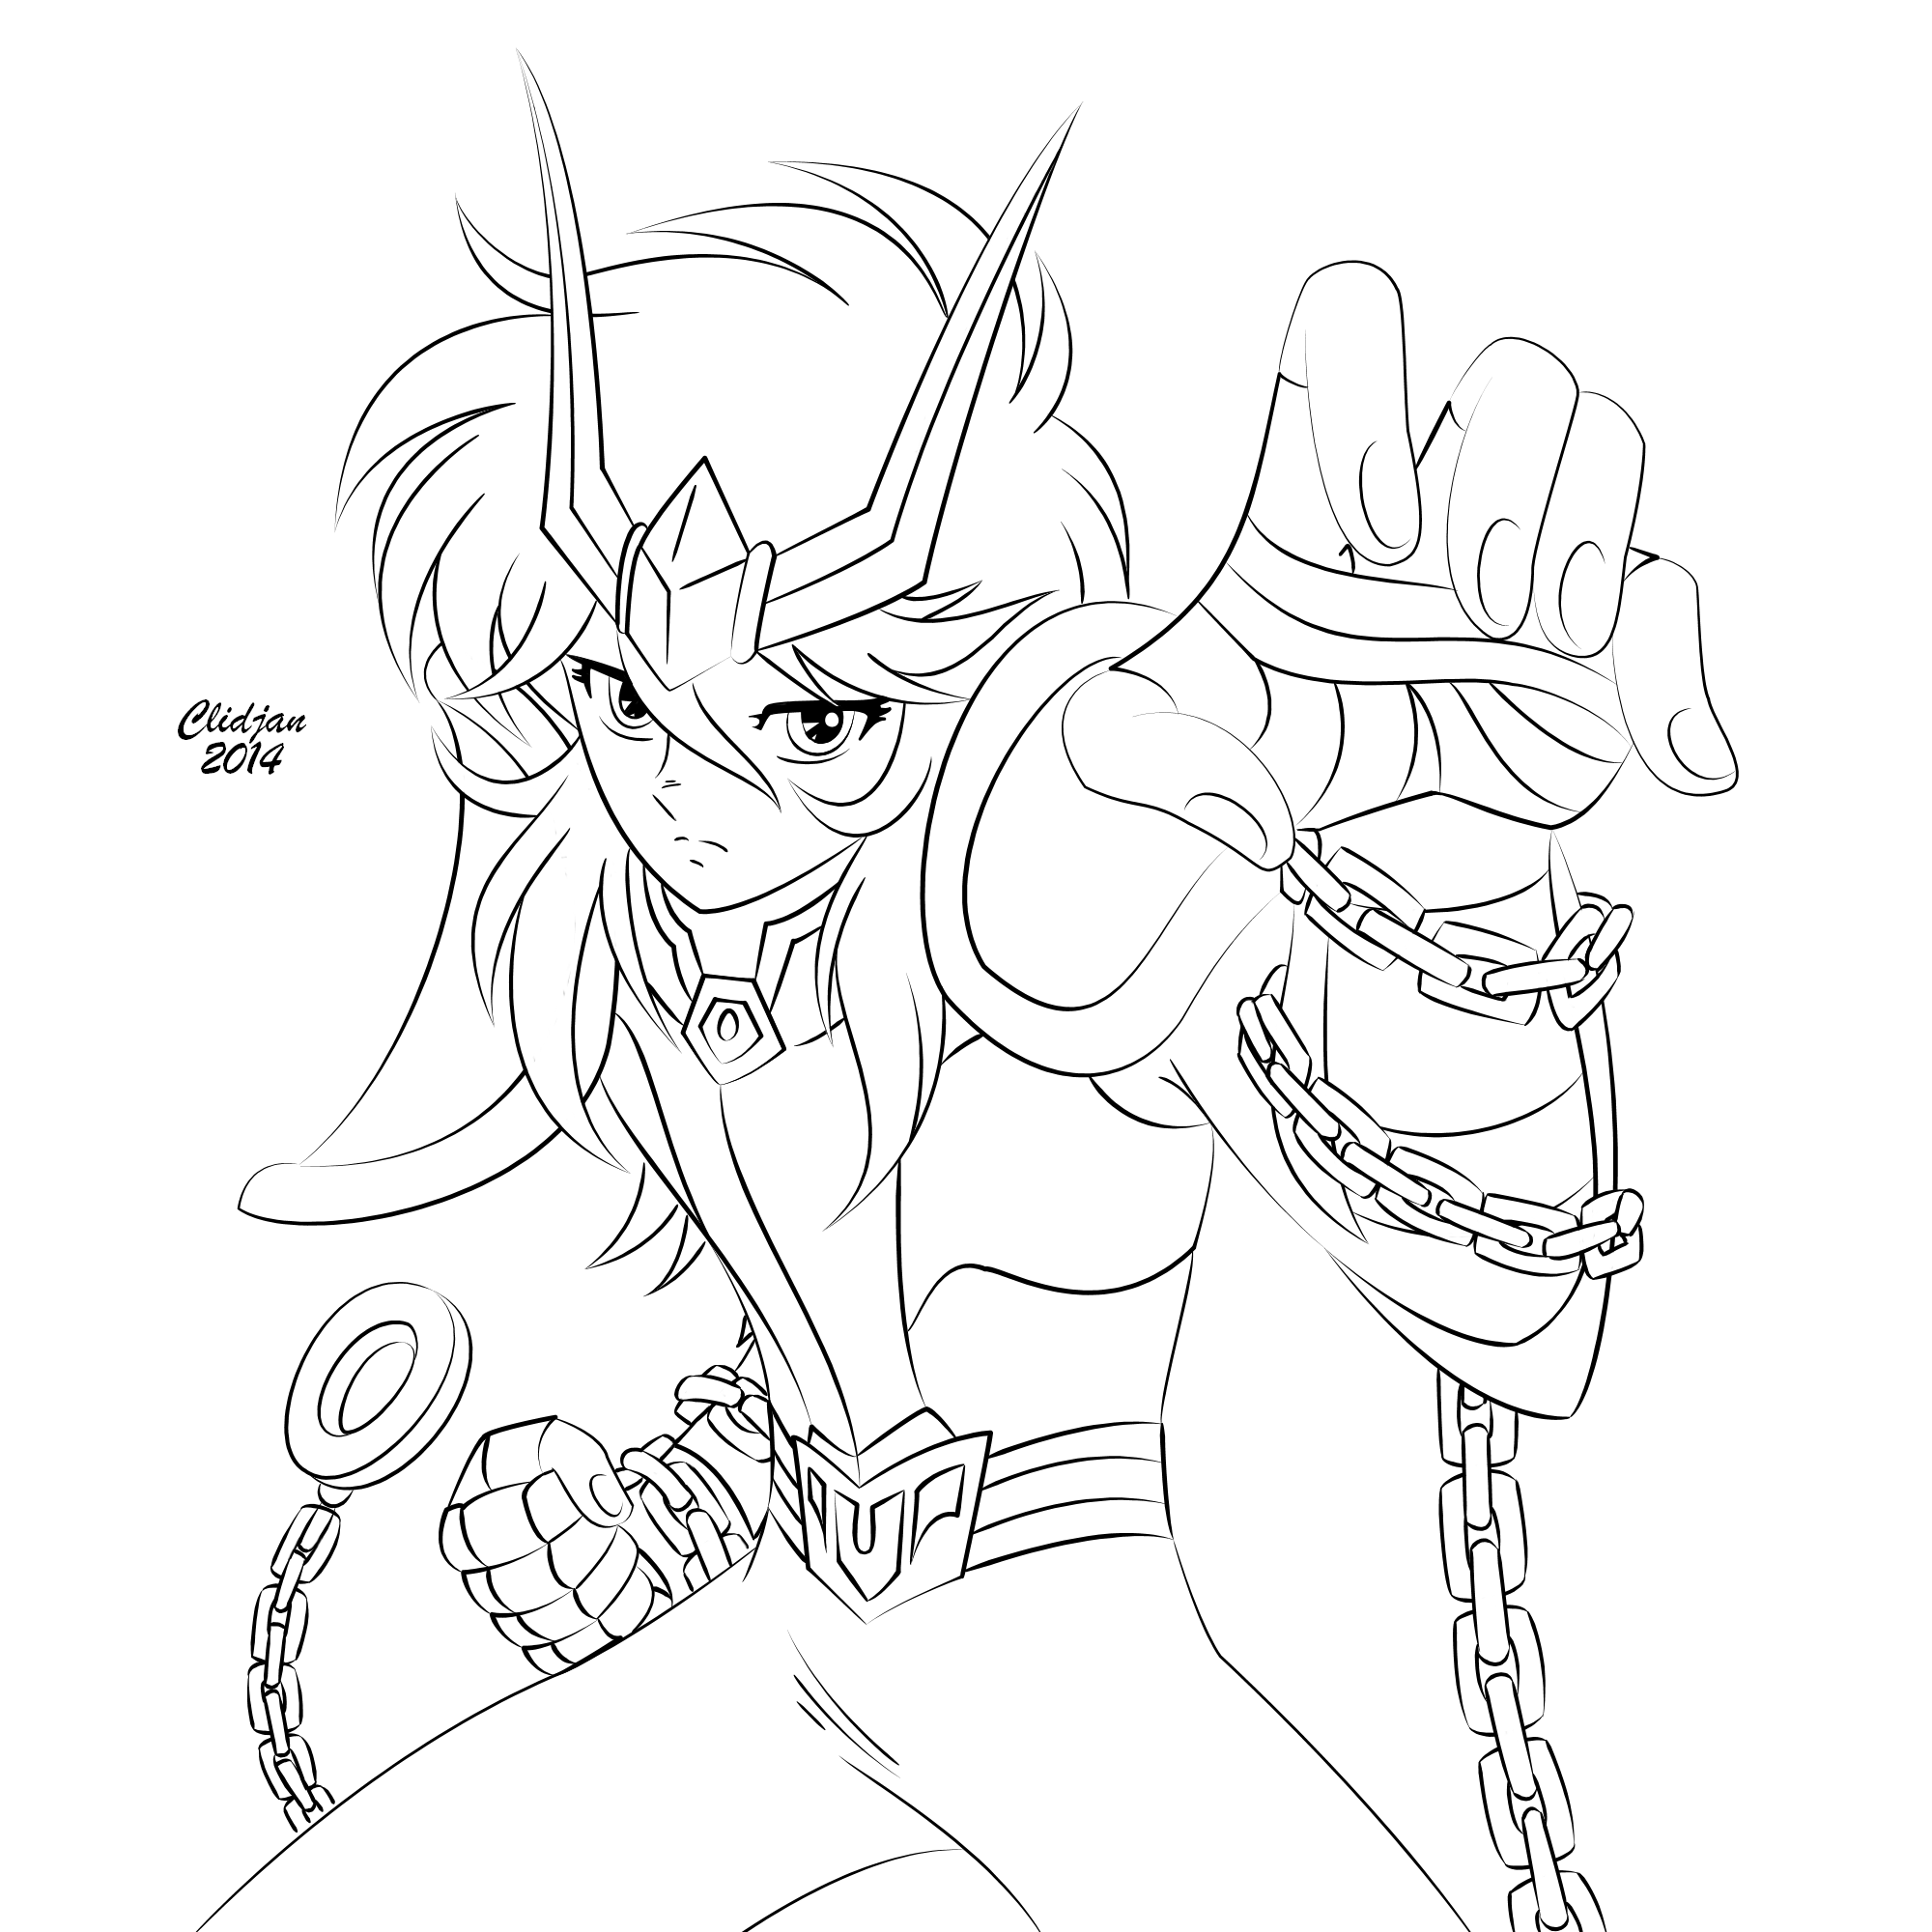 Andromeda Shun Lineart V2 By Clidjan On Deviantart